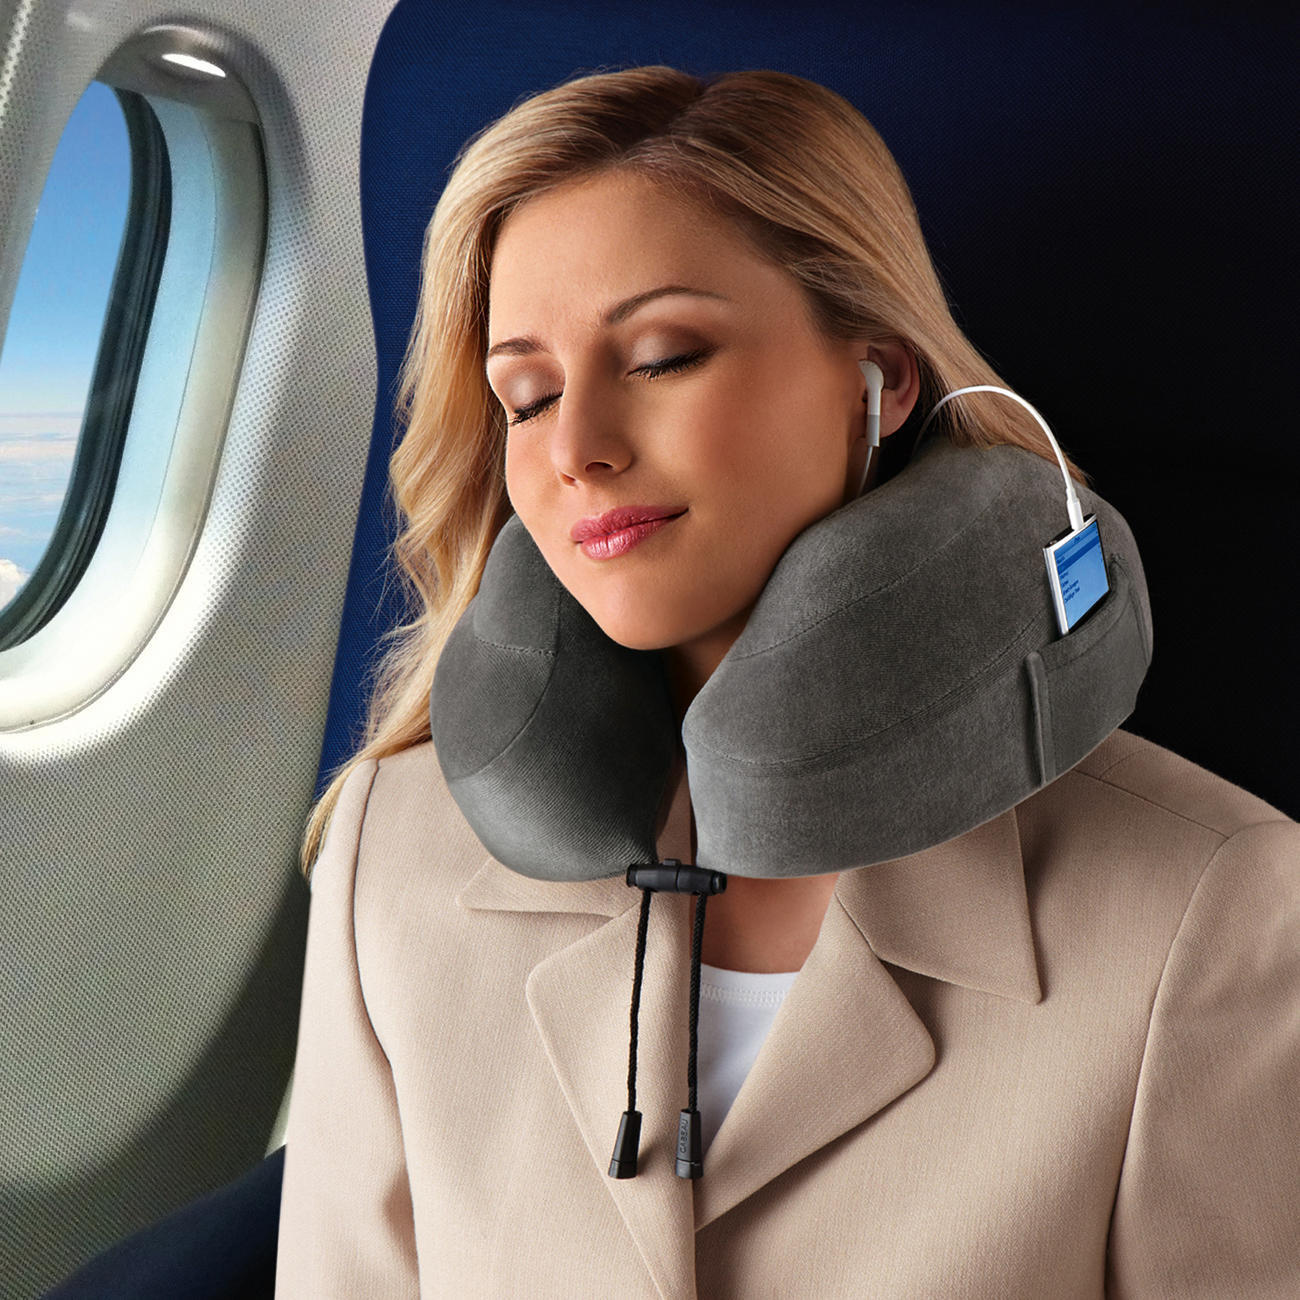 Buy Evolution Pillow Neck Pillow Online